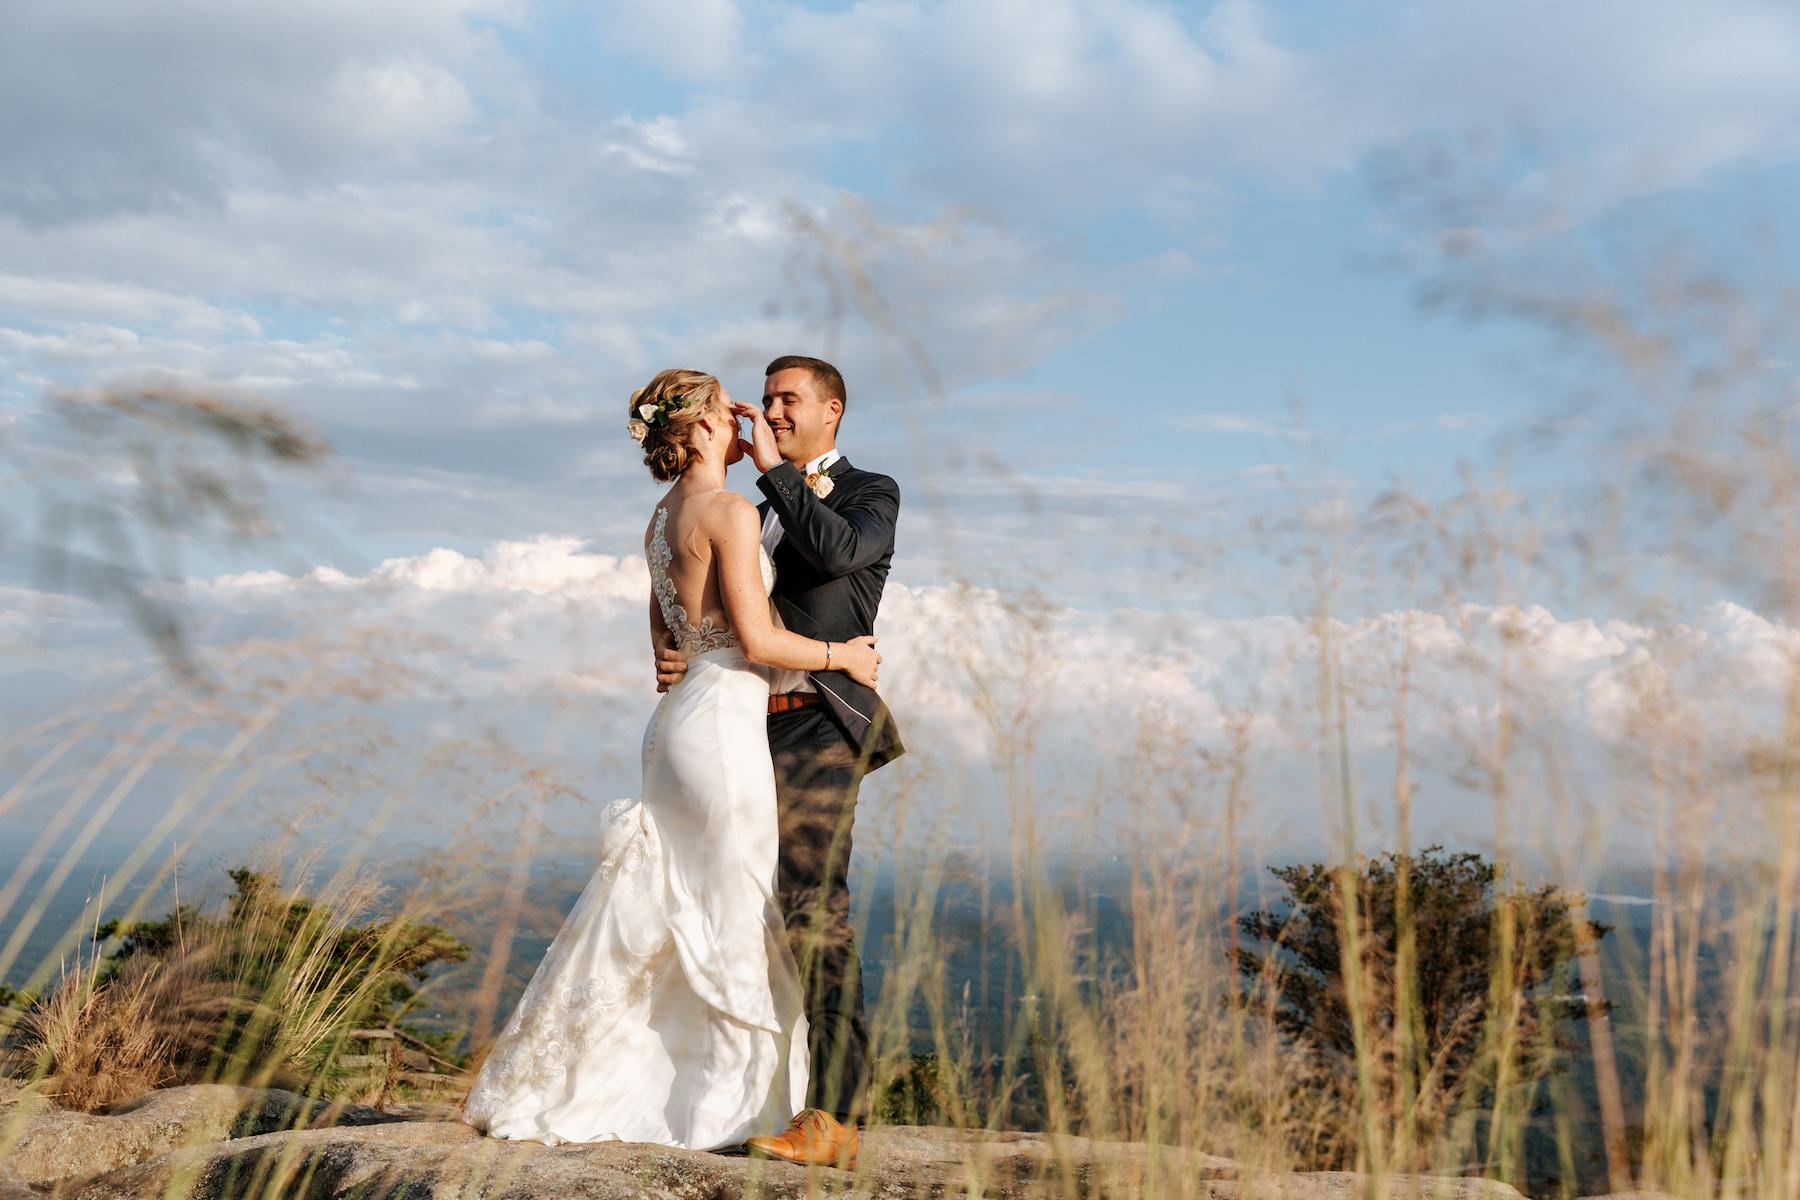 wedding-engagement-photographer-spartanburg-greenville-columbia-carolina-south-north-527.JPG